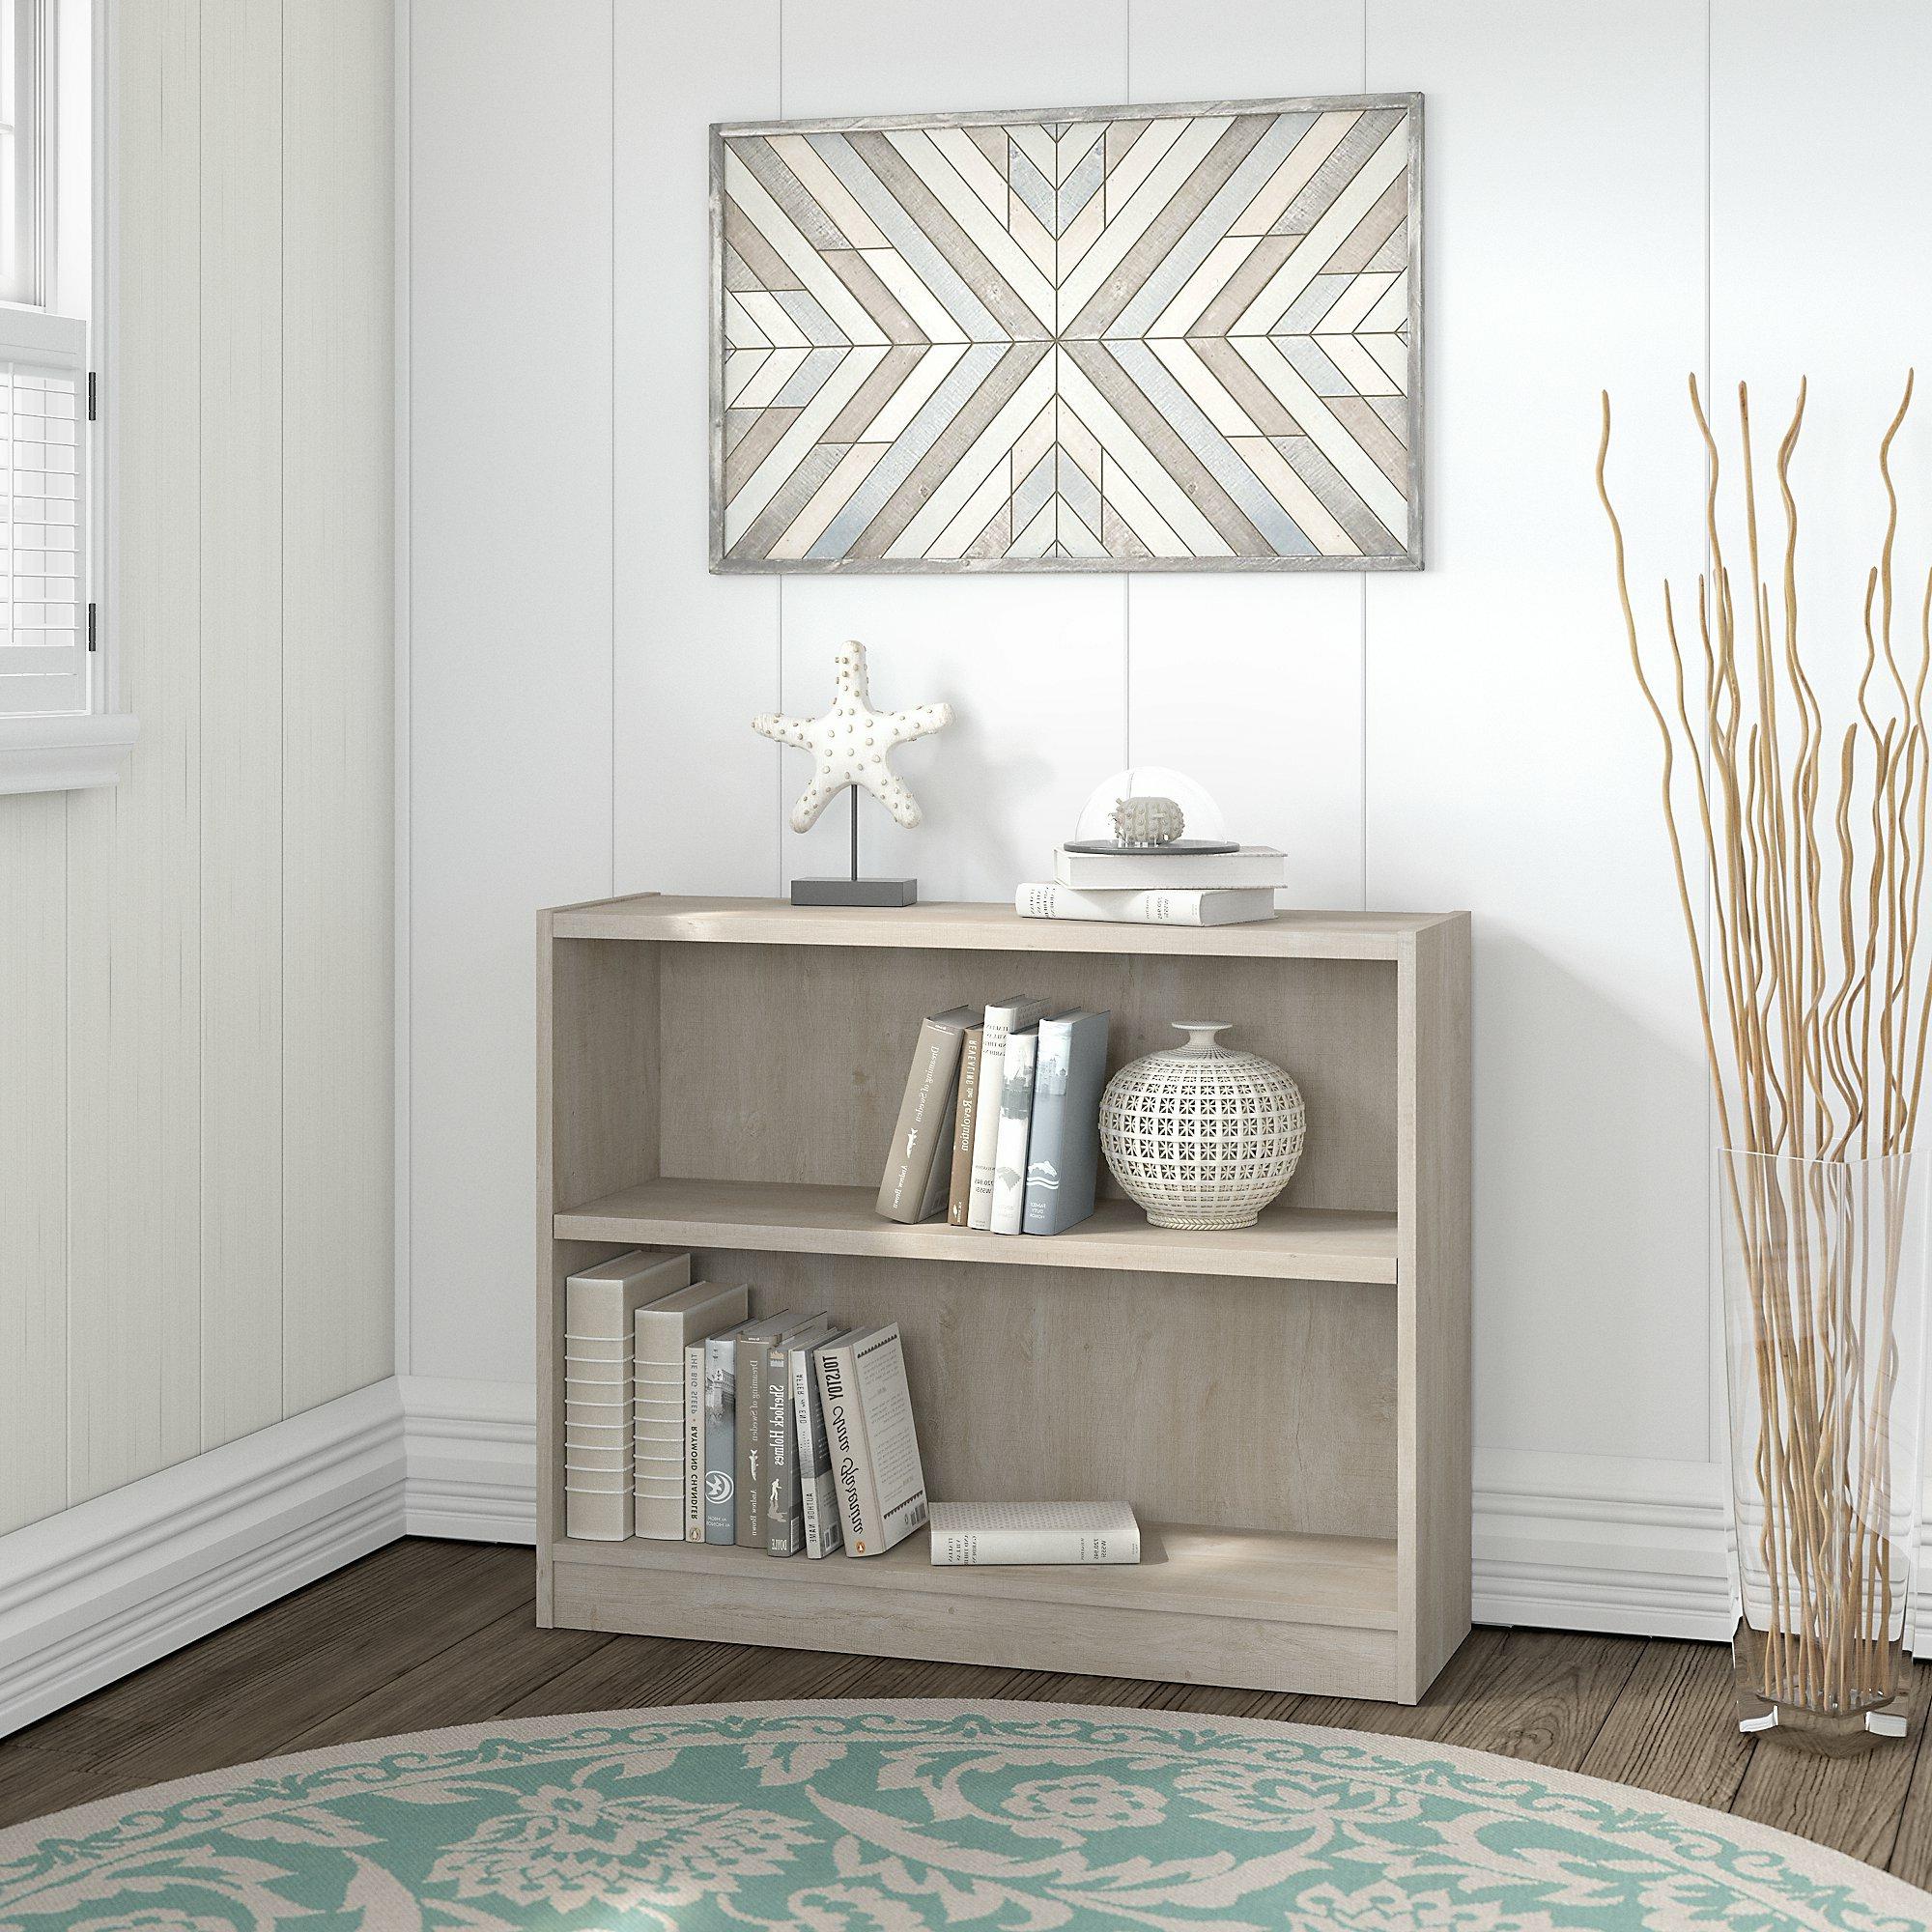 Kirkbride Standard Bookcases Regarding Recent Ebern Designs Kirkbride Standard Bookcase (View 4 of 20)